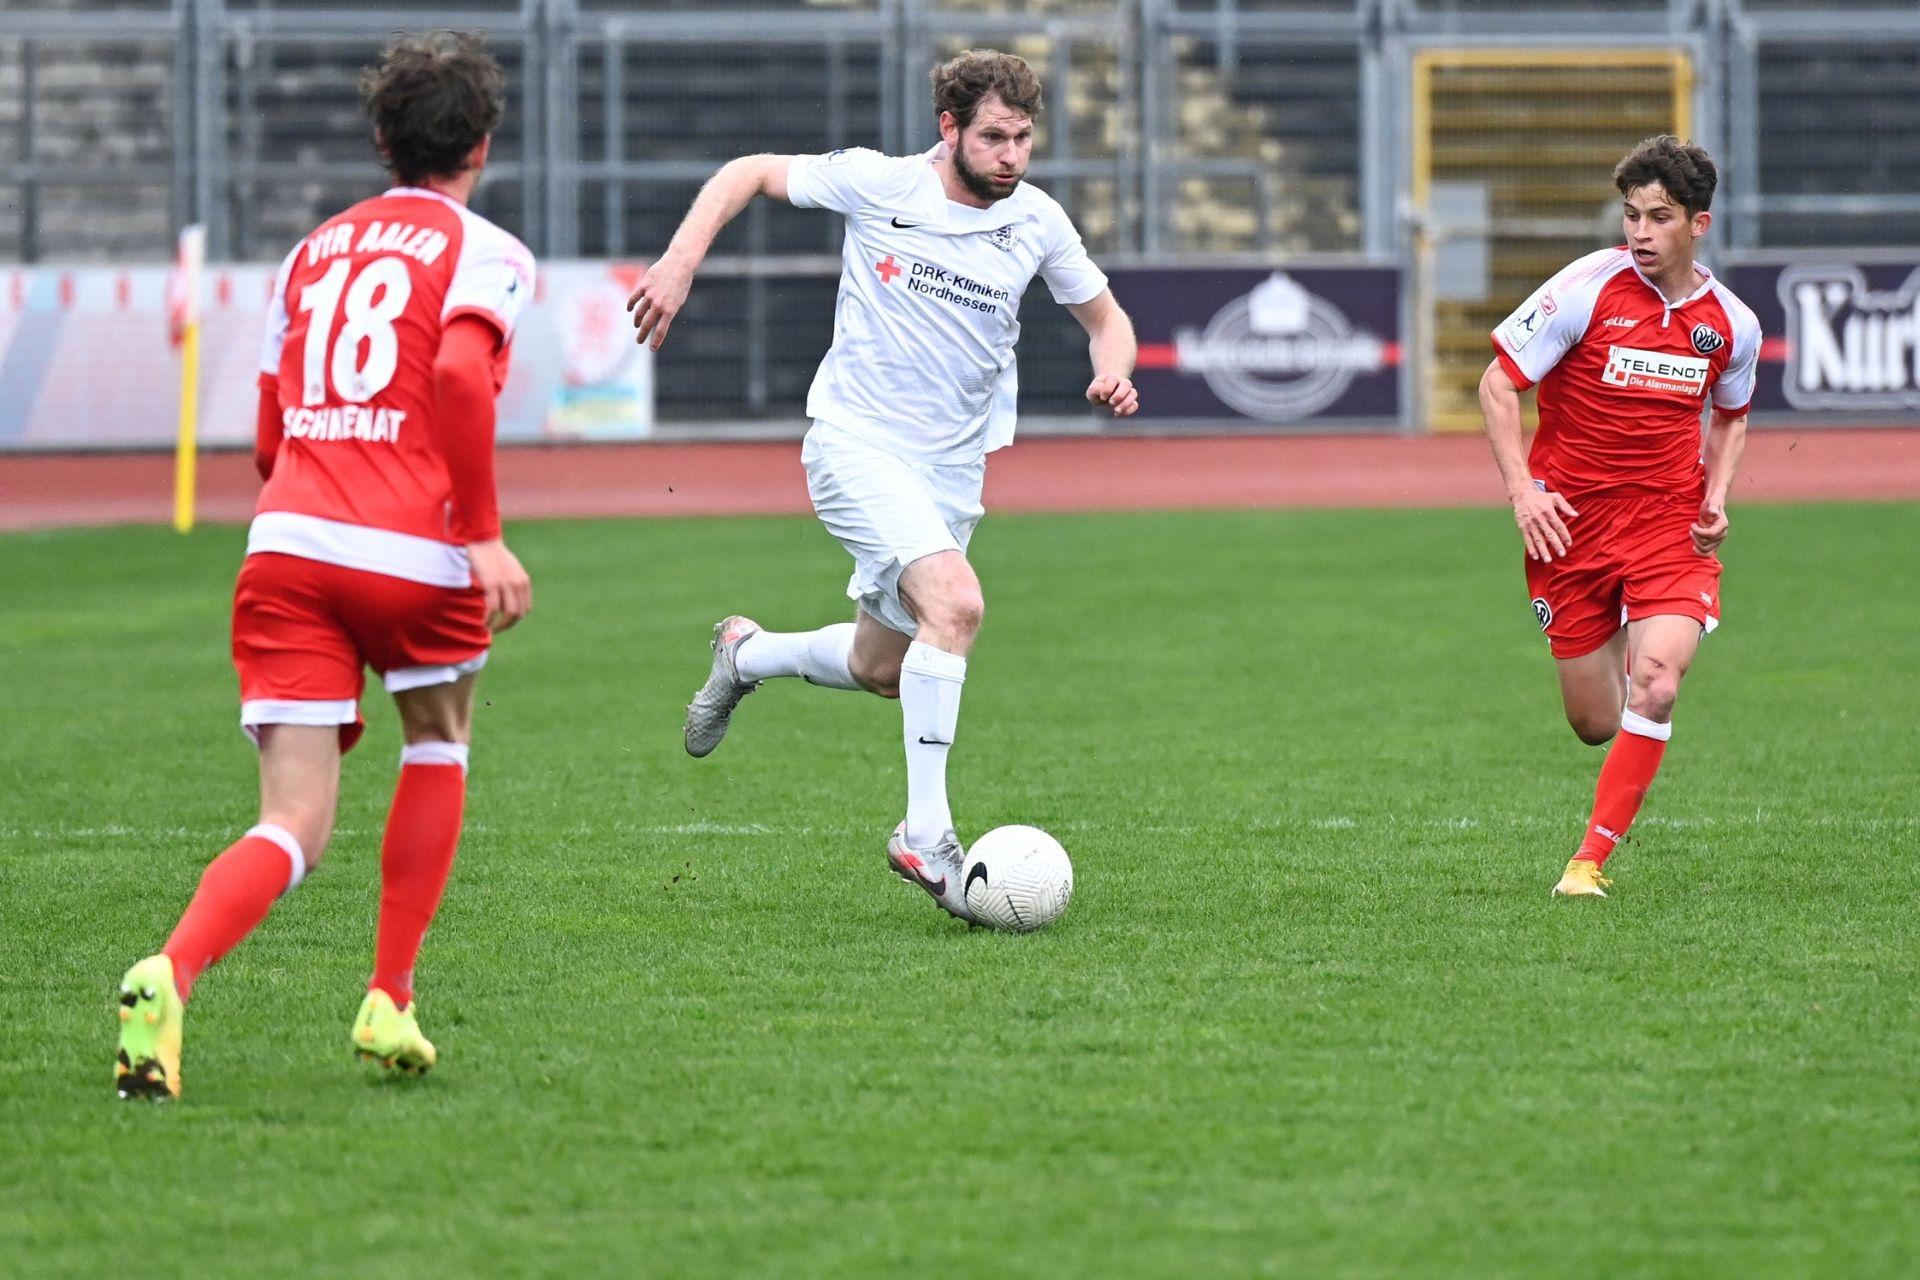 Regionalliga S�dwest 2020/21, KSV Hessen Kassel, VfR Aalen, Endstand 1:1